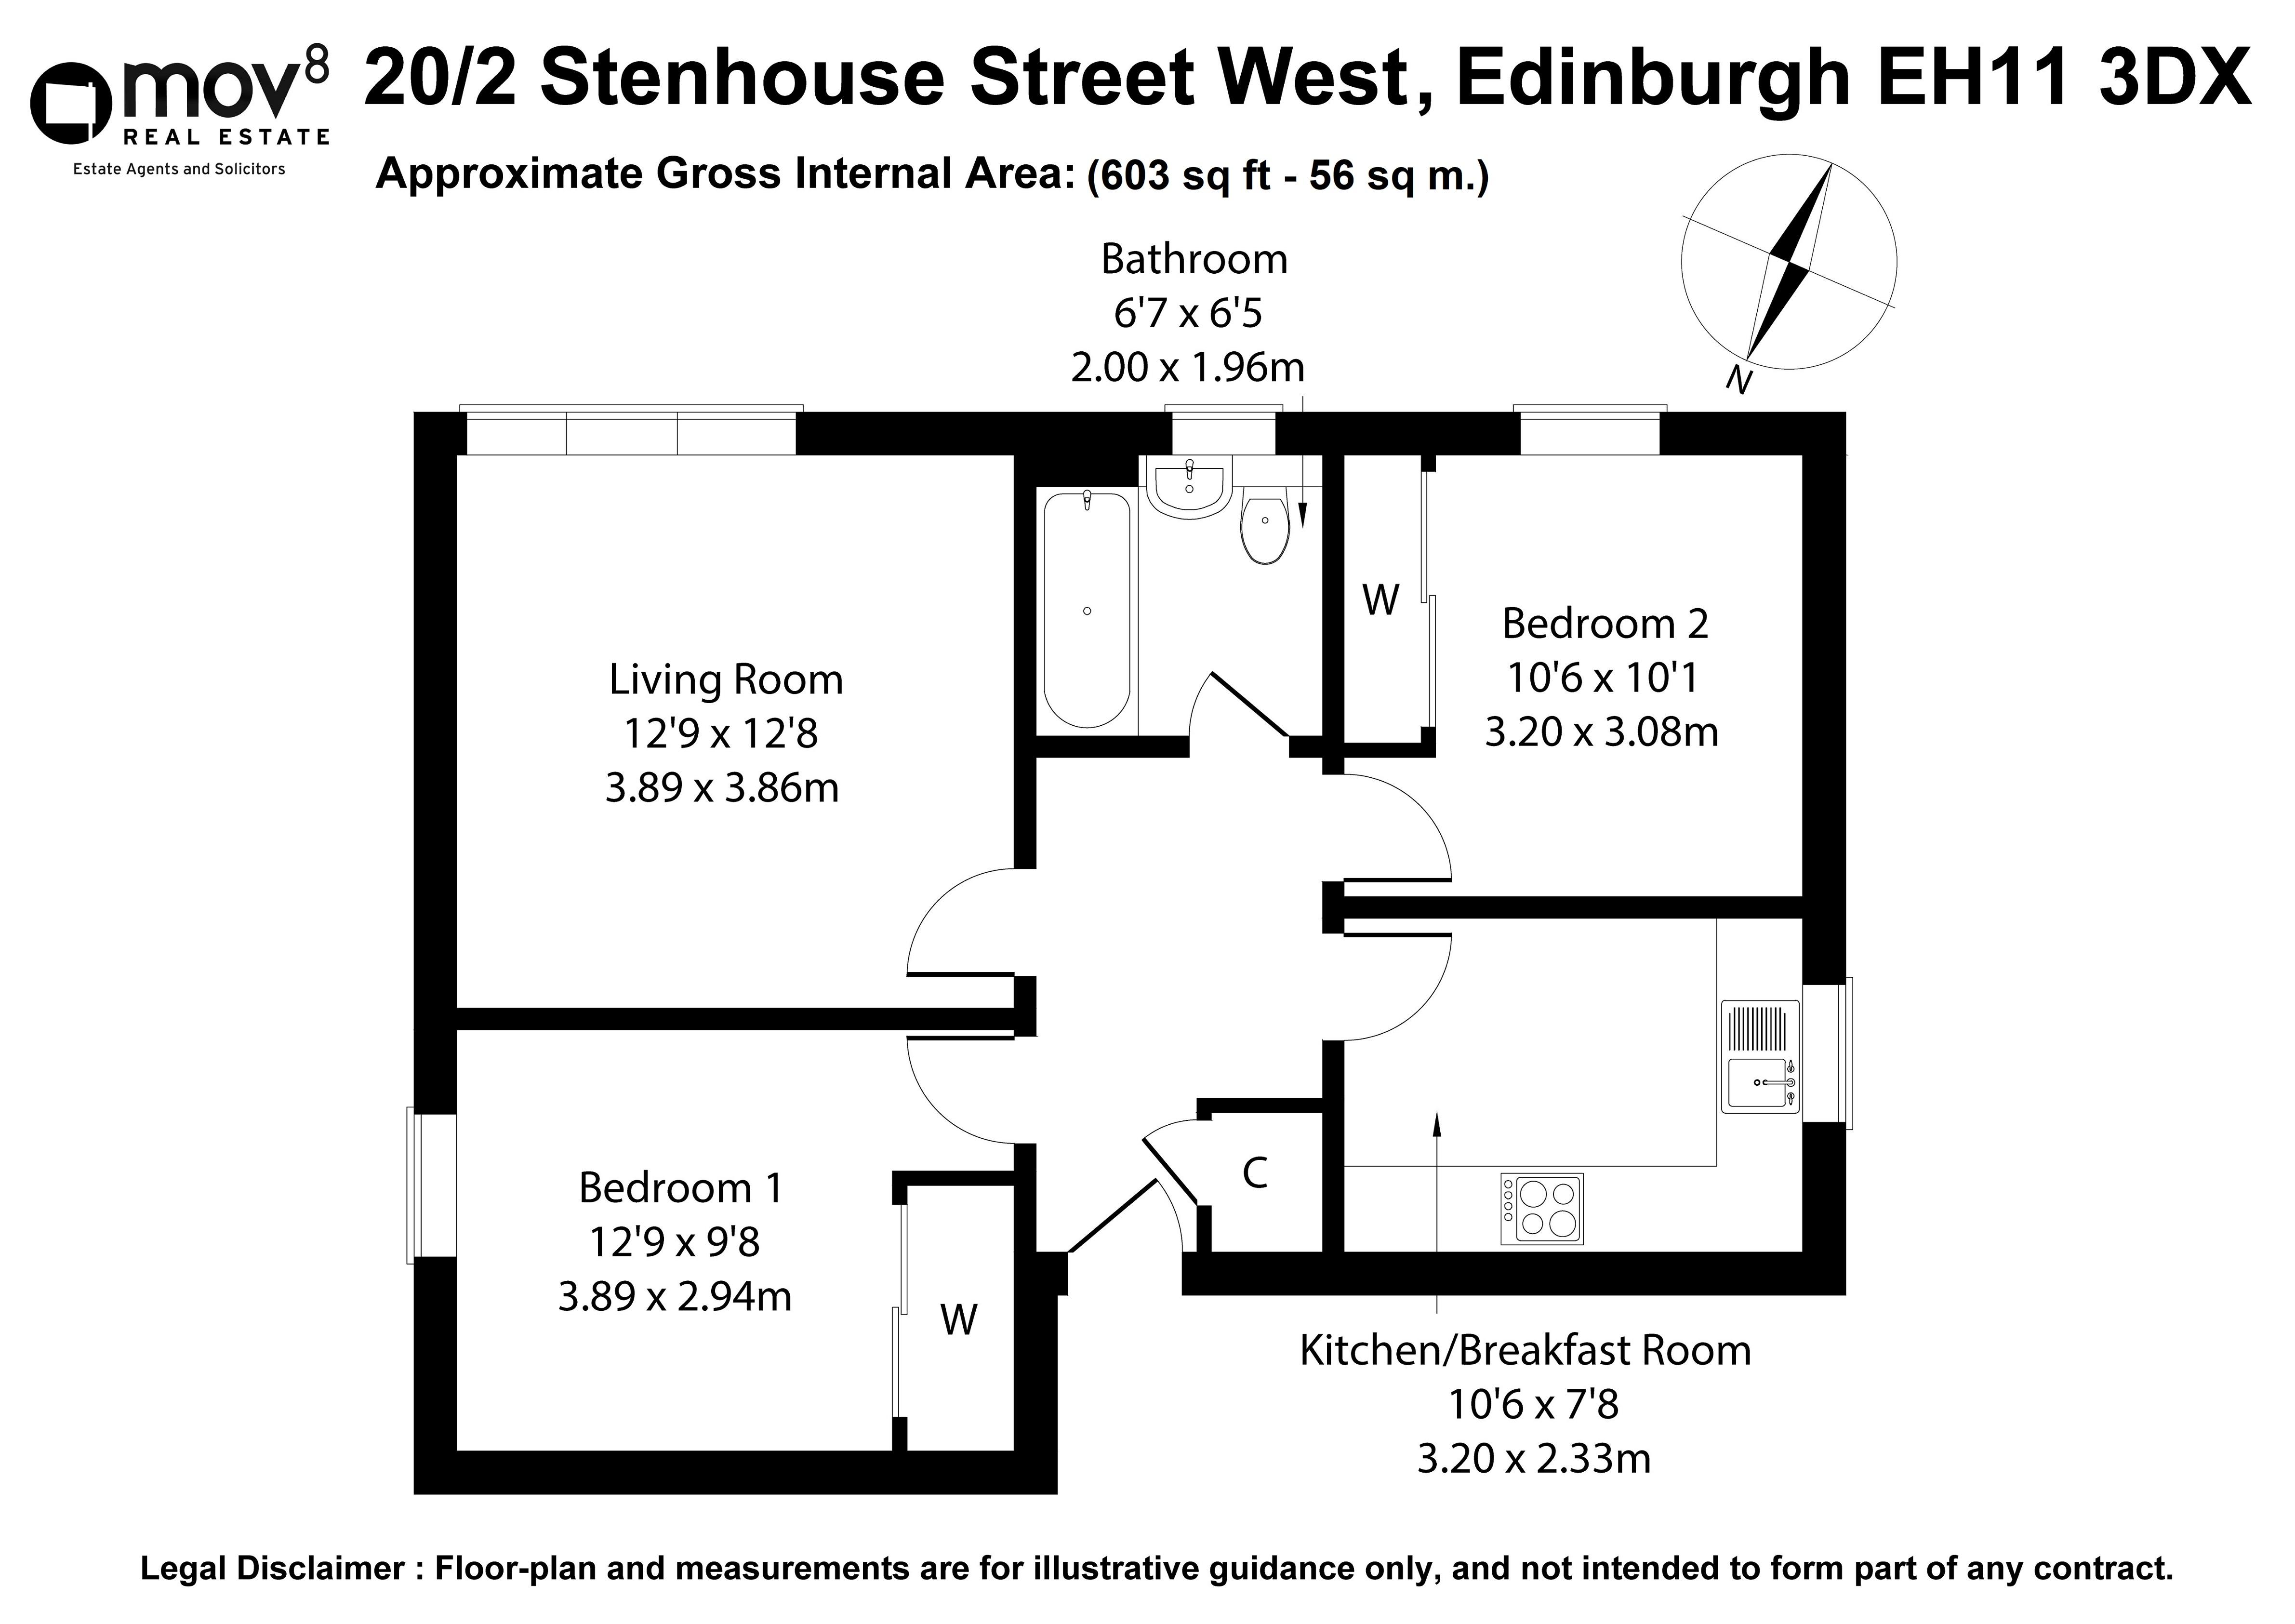 Floorplan 1 of 20/2, Stenhouse Street West, Stenhouse, Edinburgh, EH11 3DX